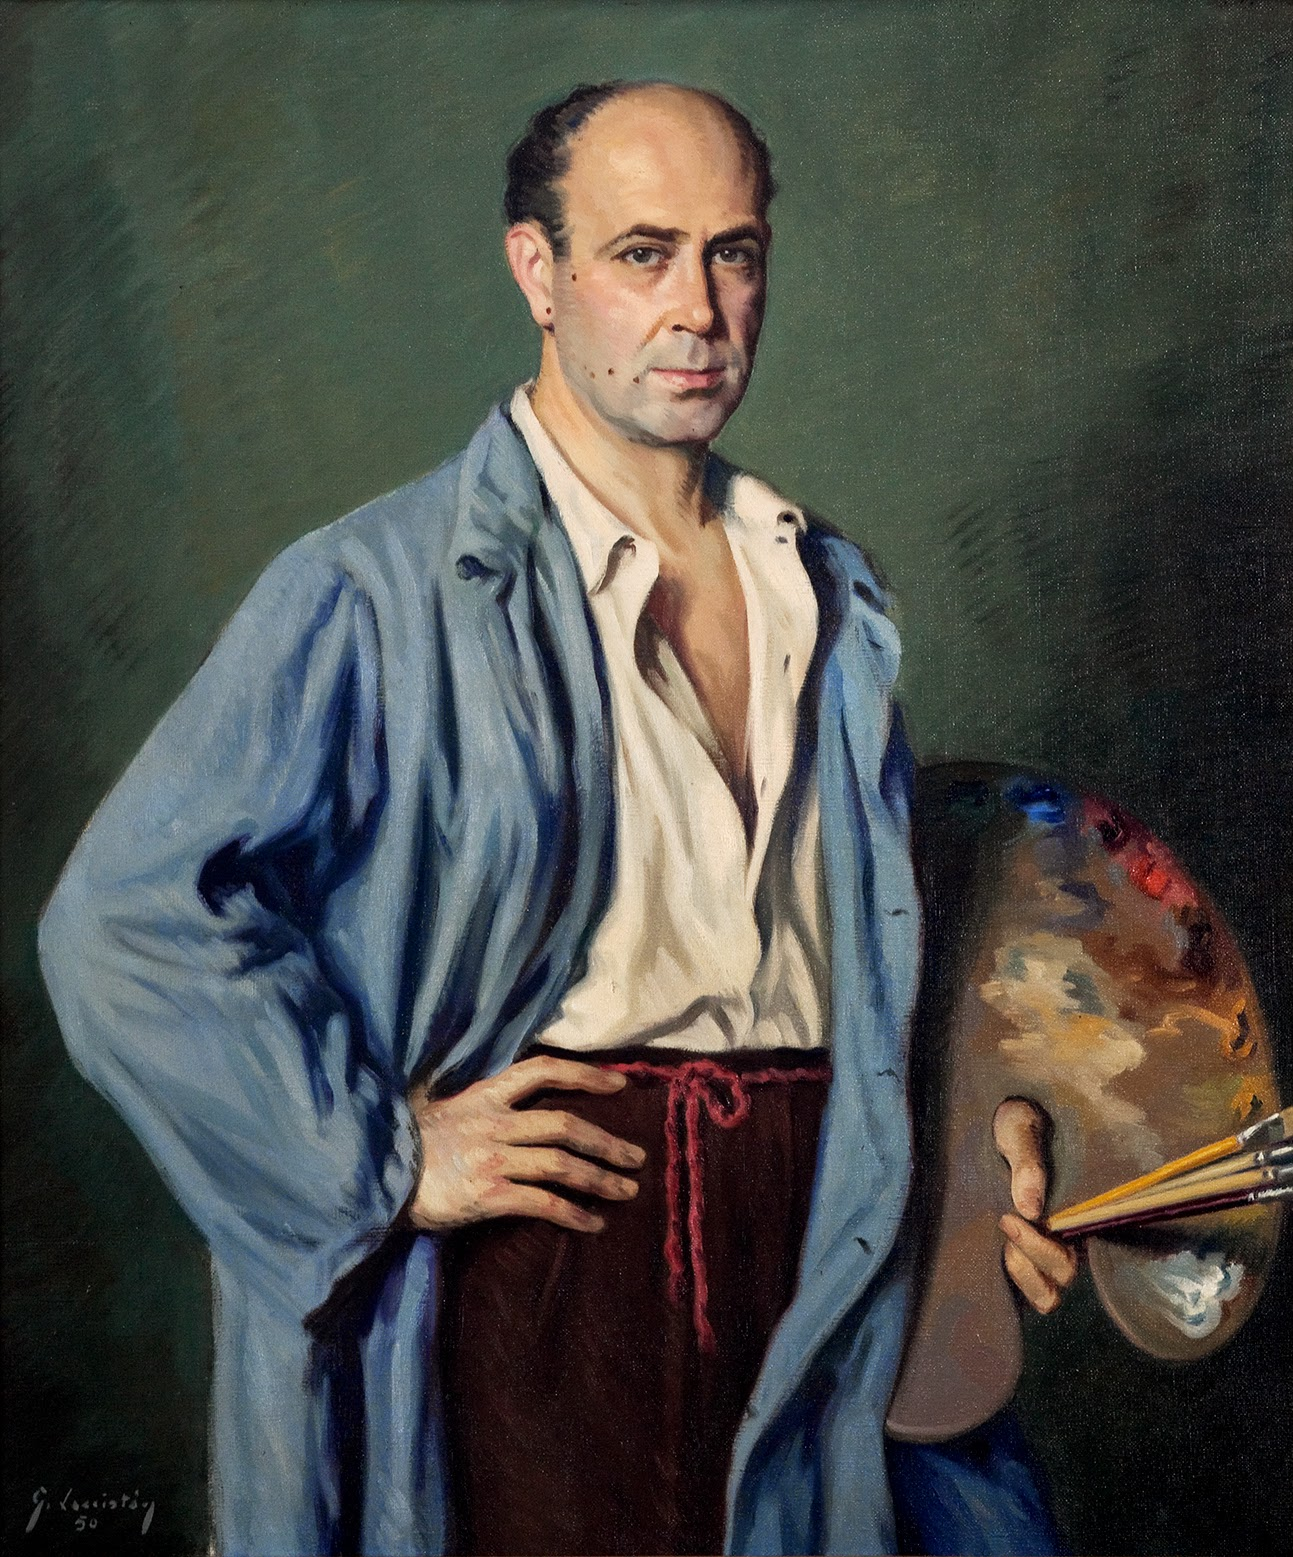 Gerardo Sacristán Torralba